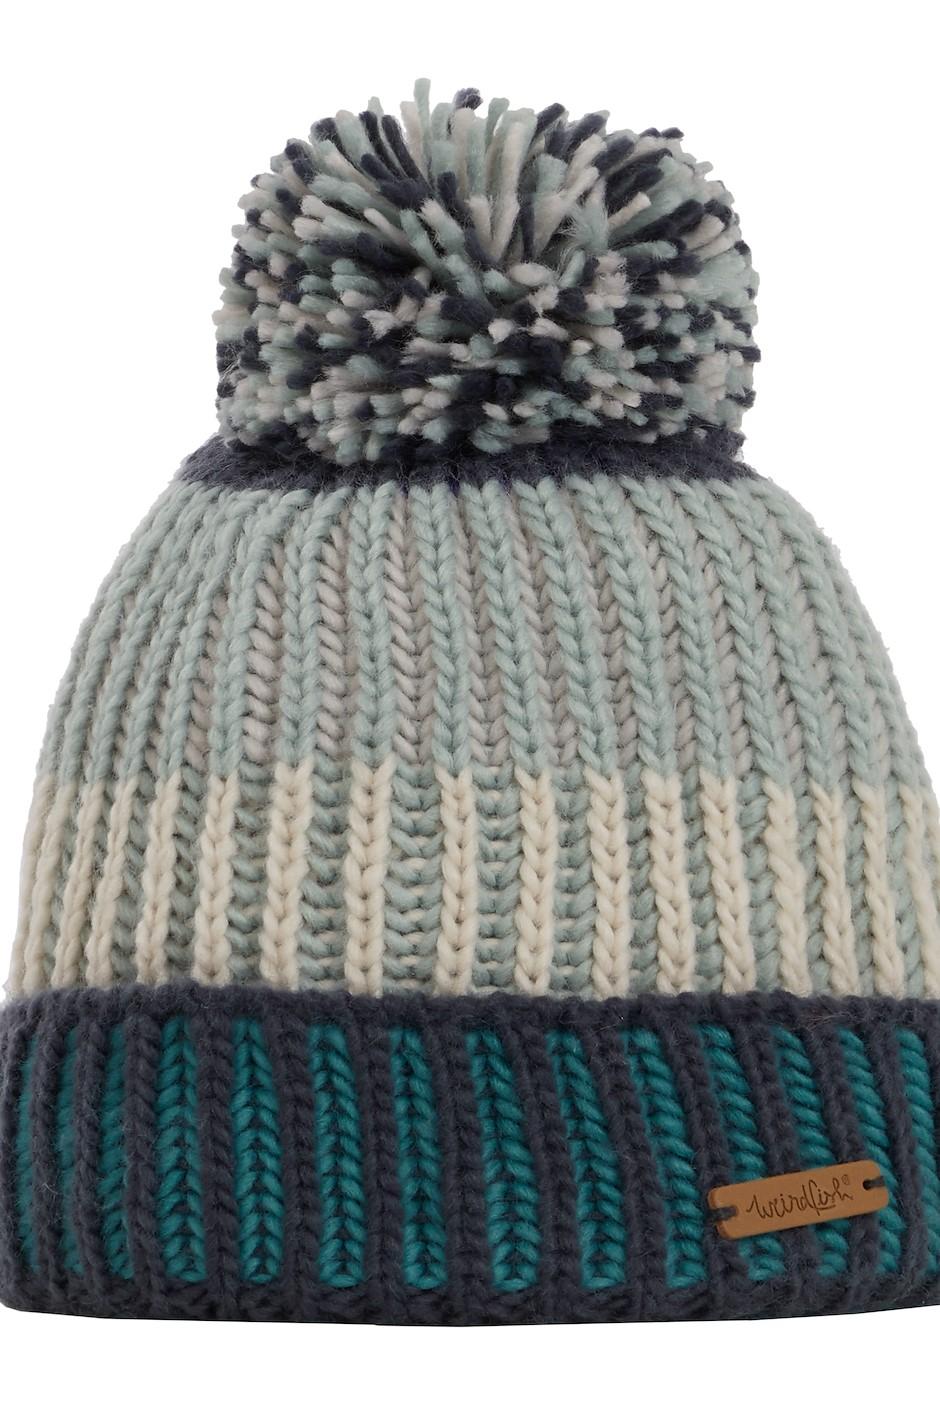 Nemi Striped Rib Knit Bobble Hat Navy